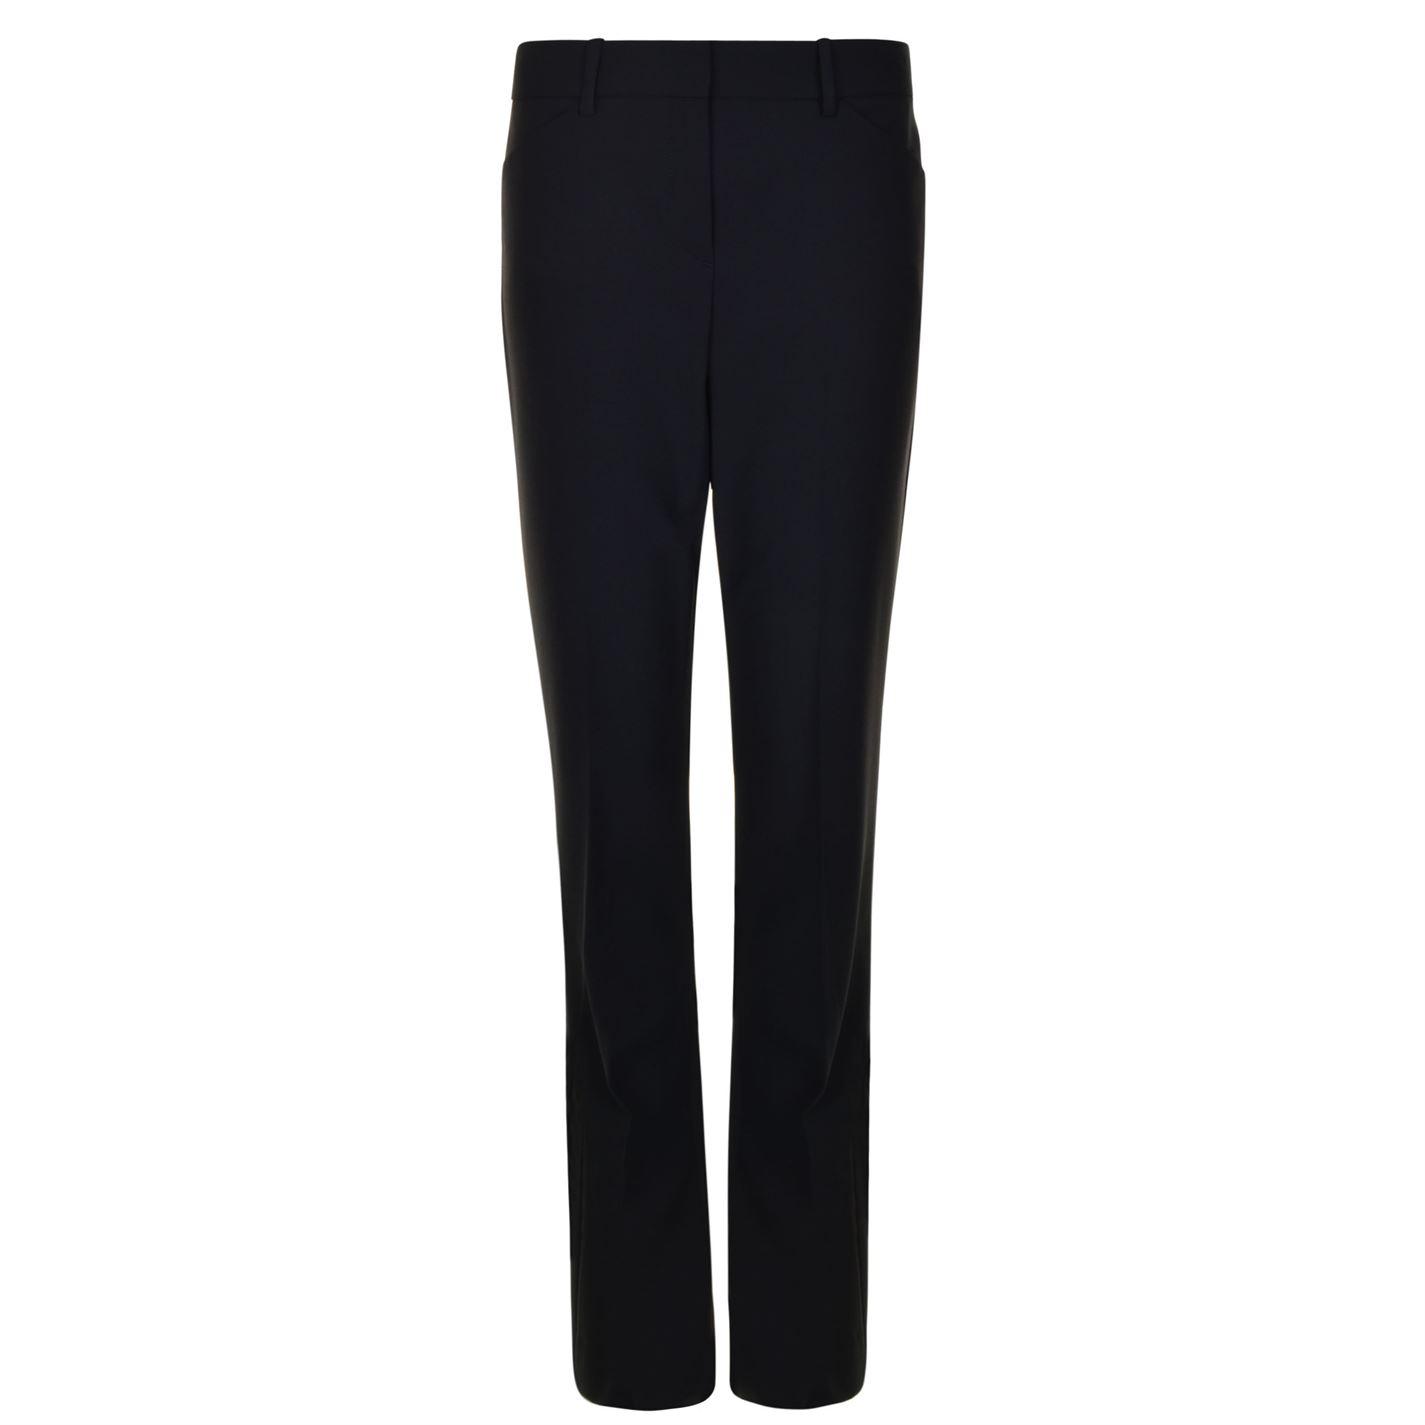 THEORY Custom Max 2 Trousers